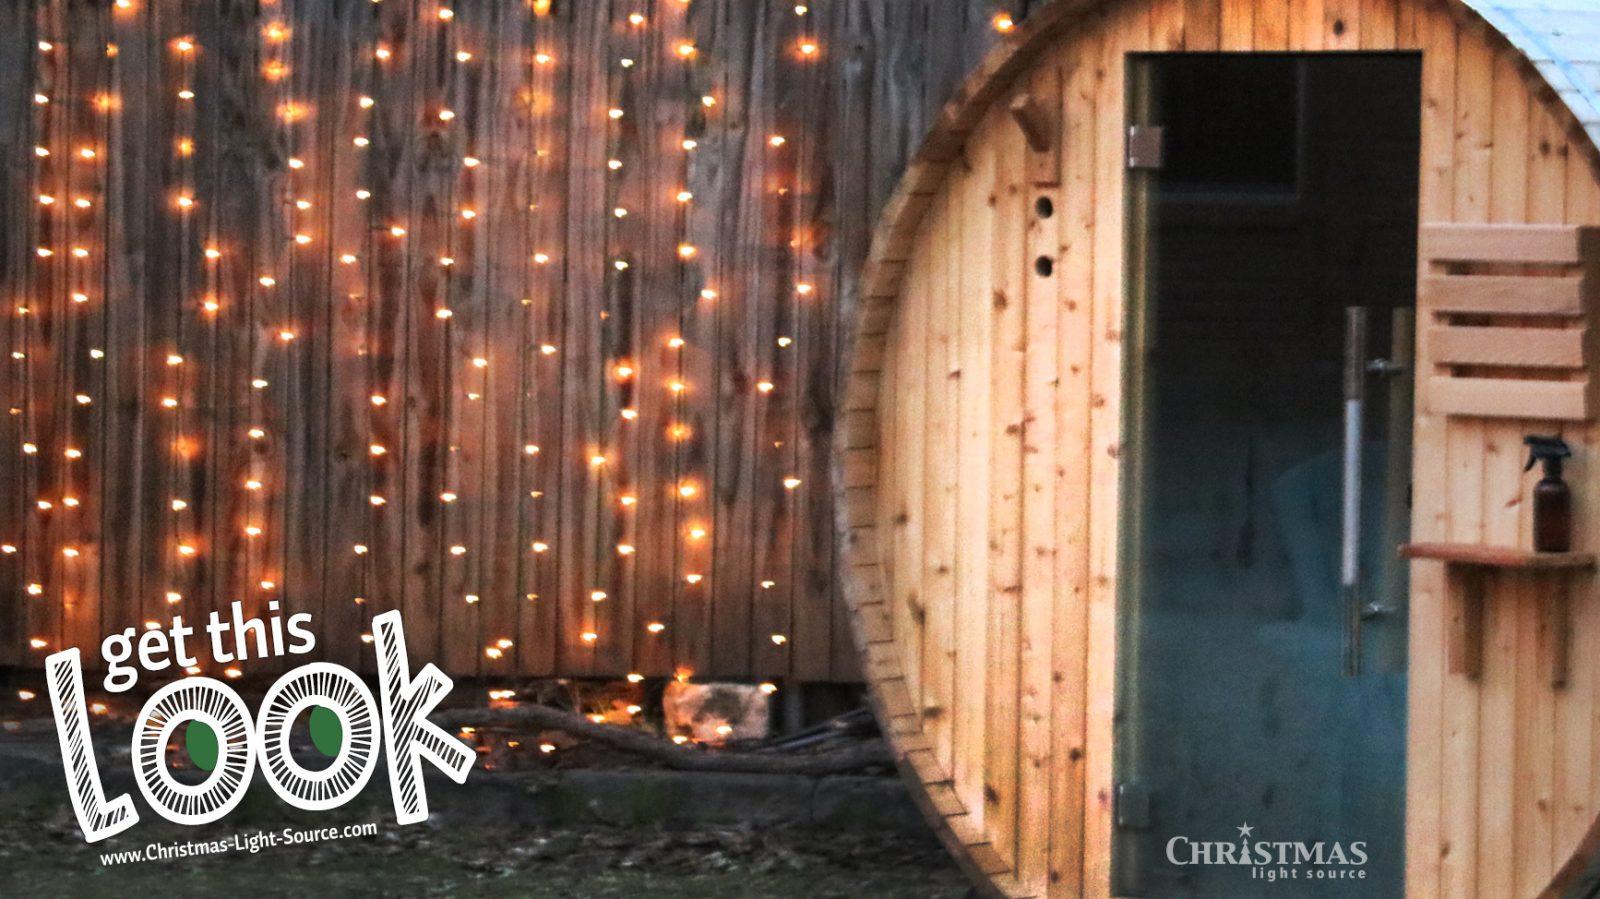 Light a backyard fence for a reception